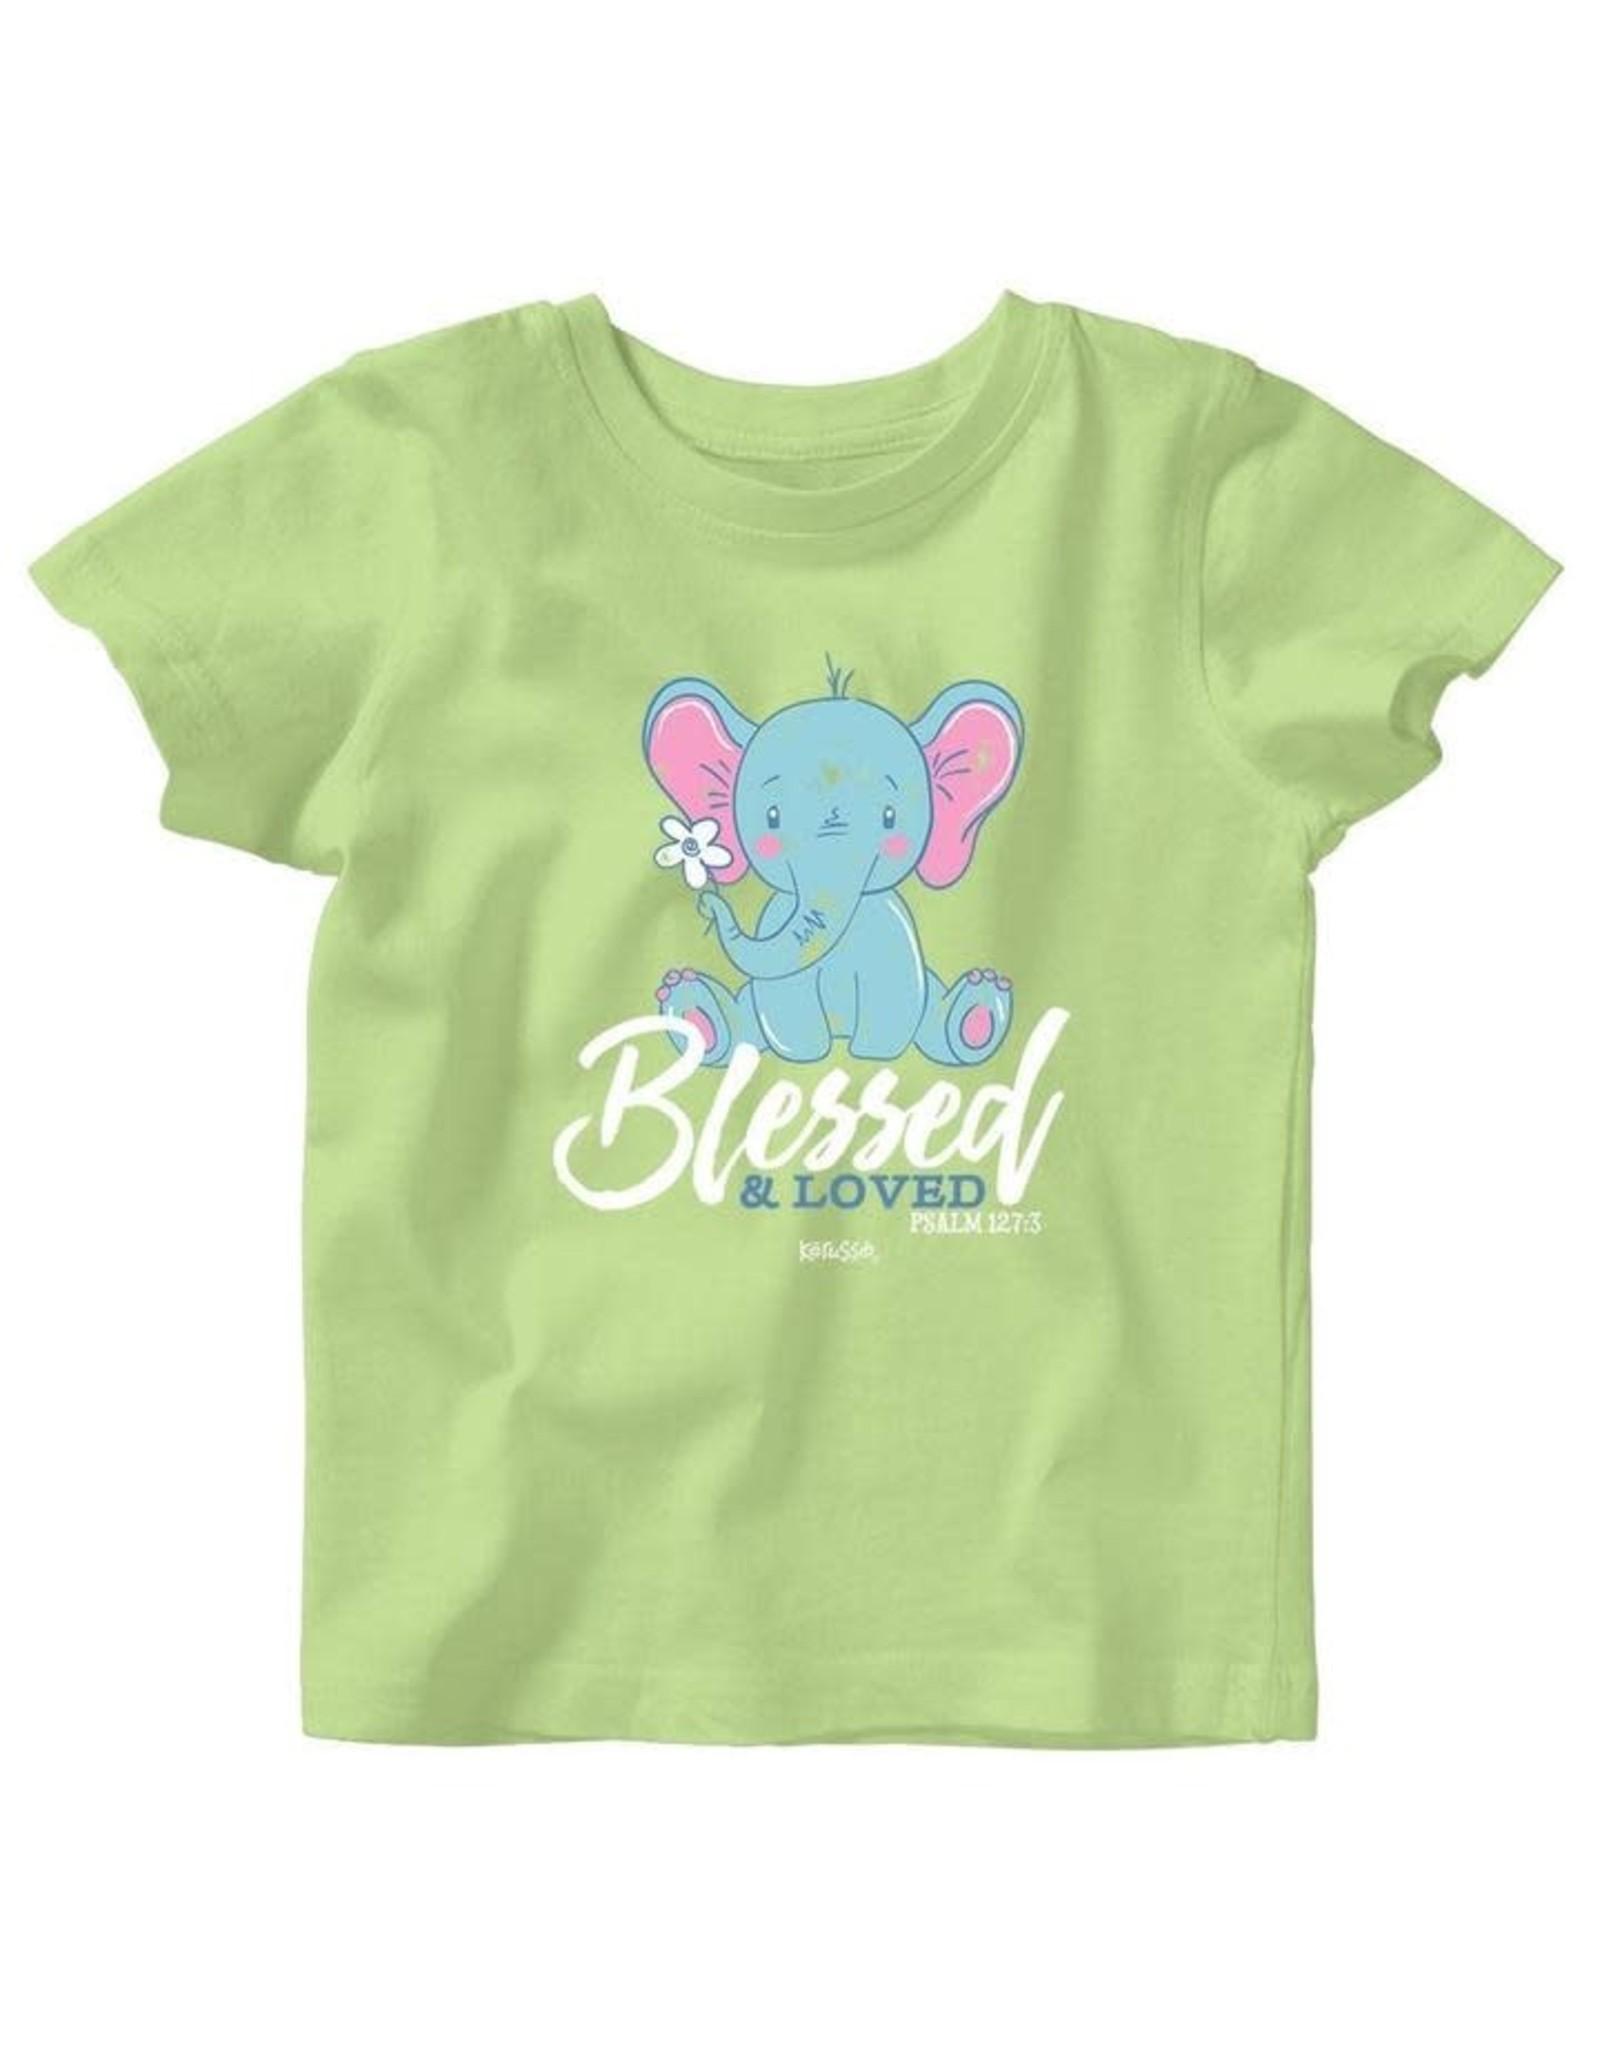 Baby Shirt - Baby Elephant